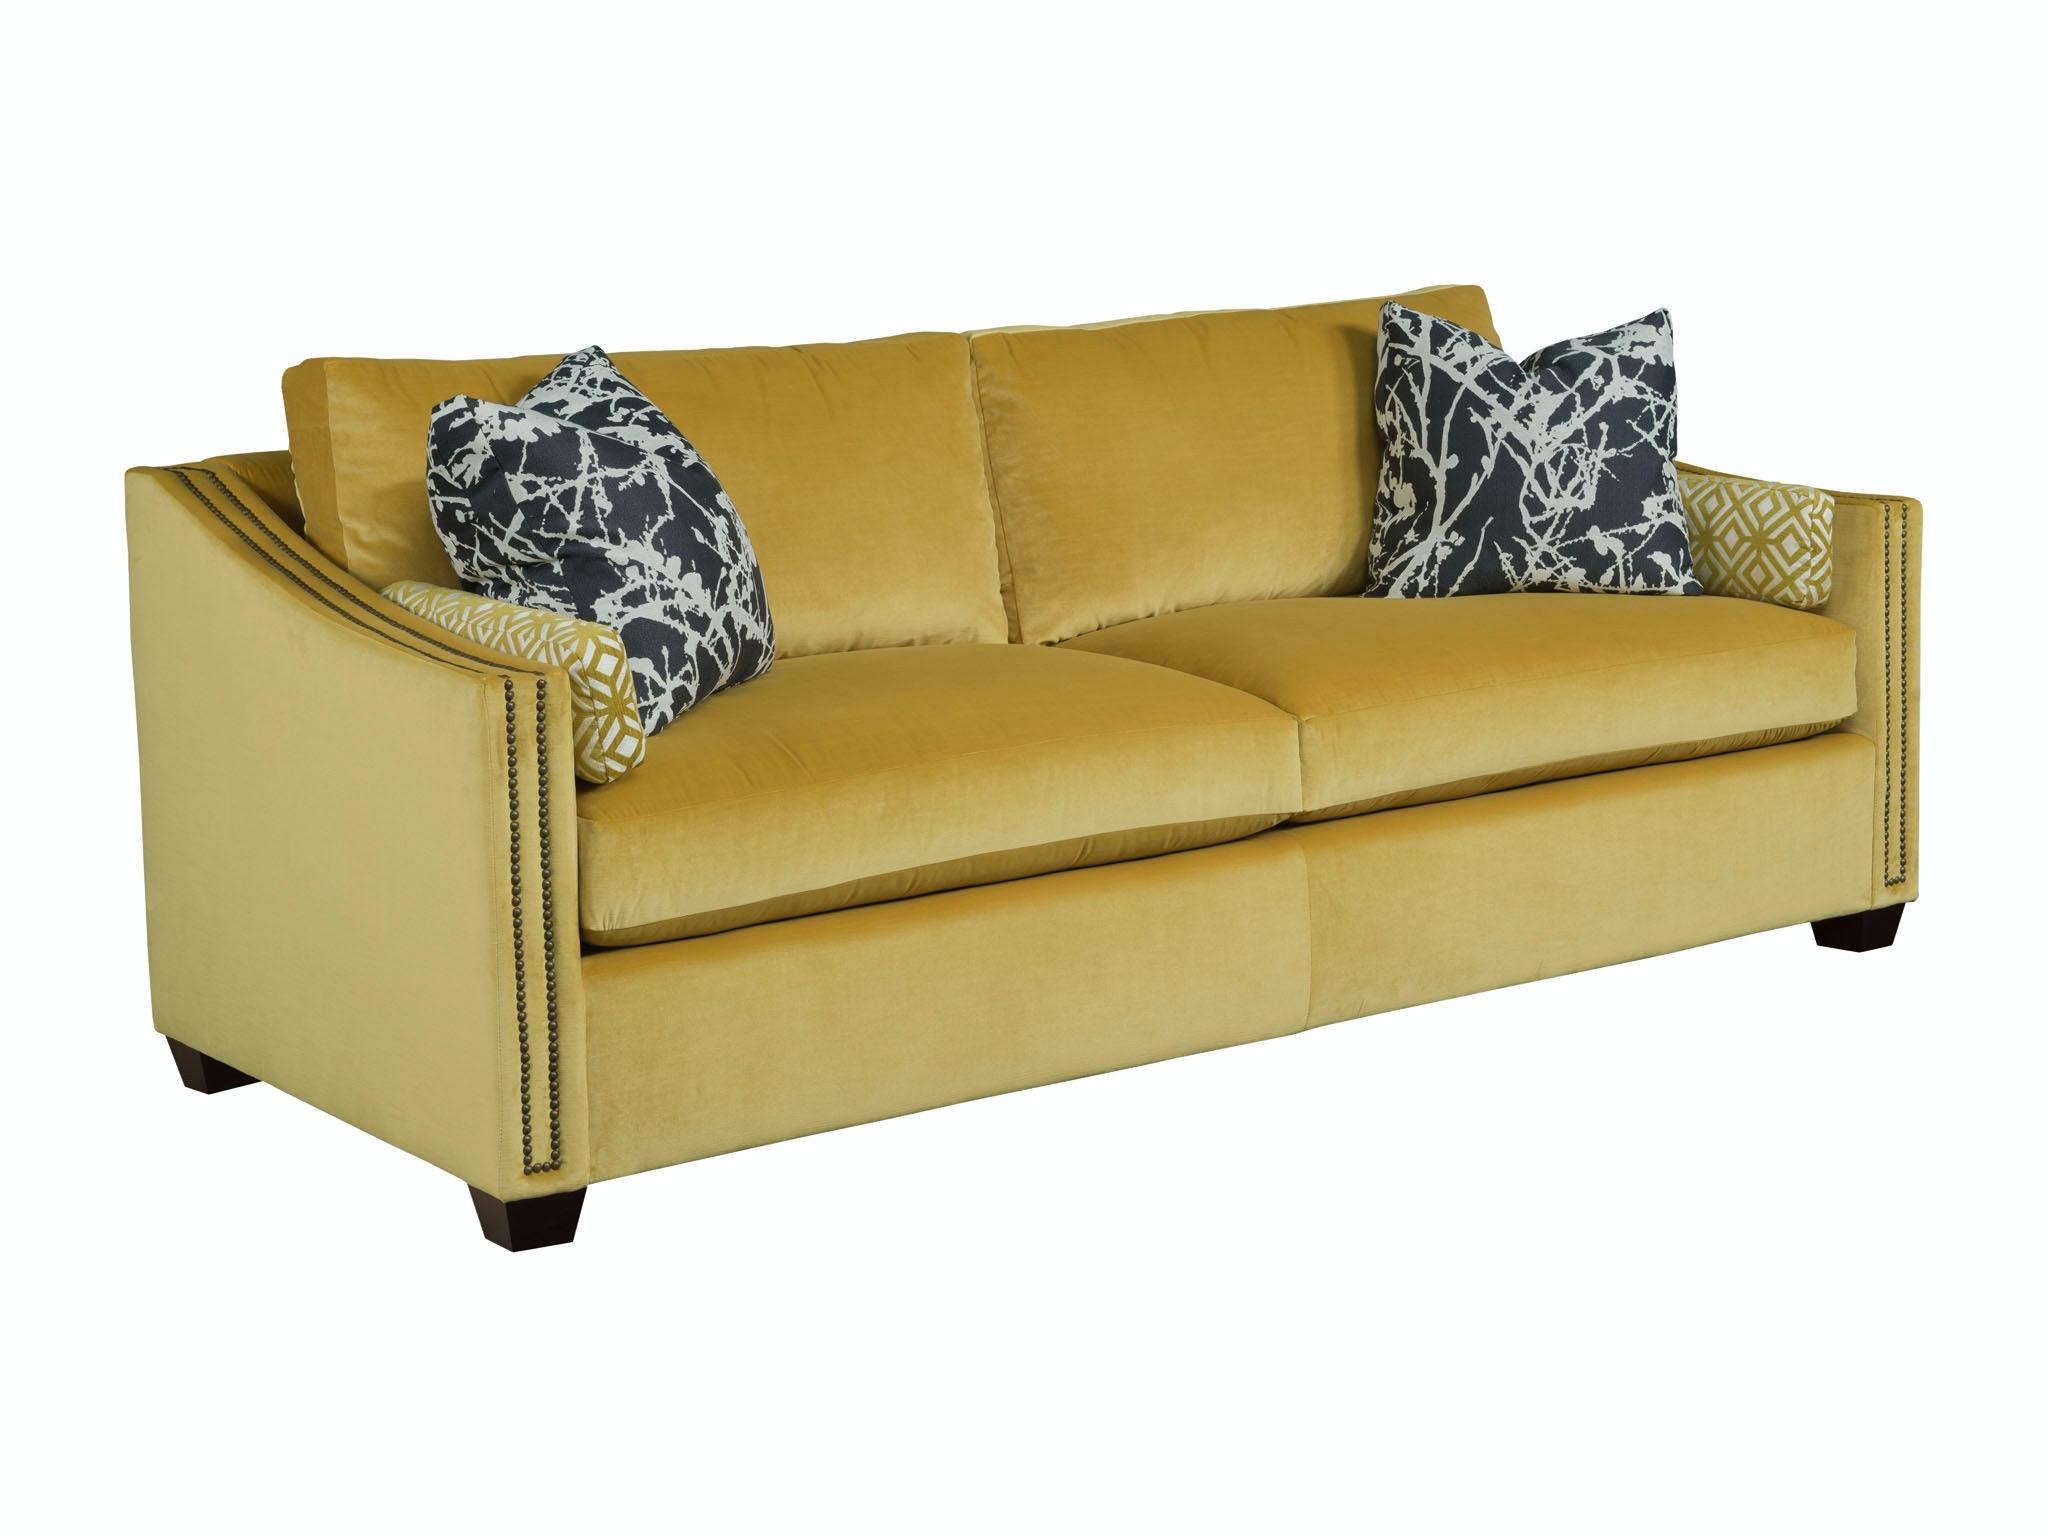 Ordinaire 312 86. Linear Sofa